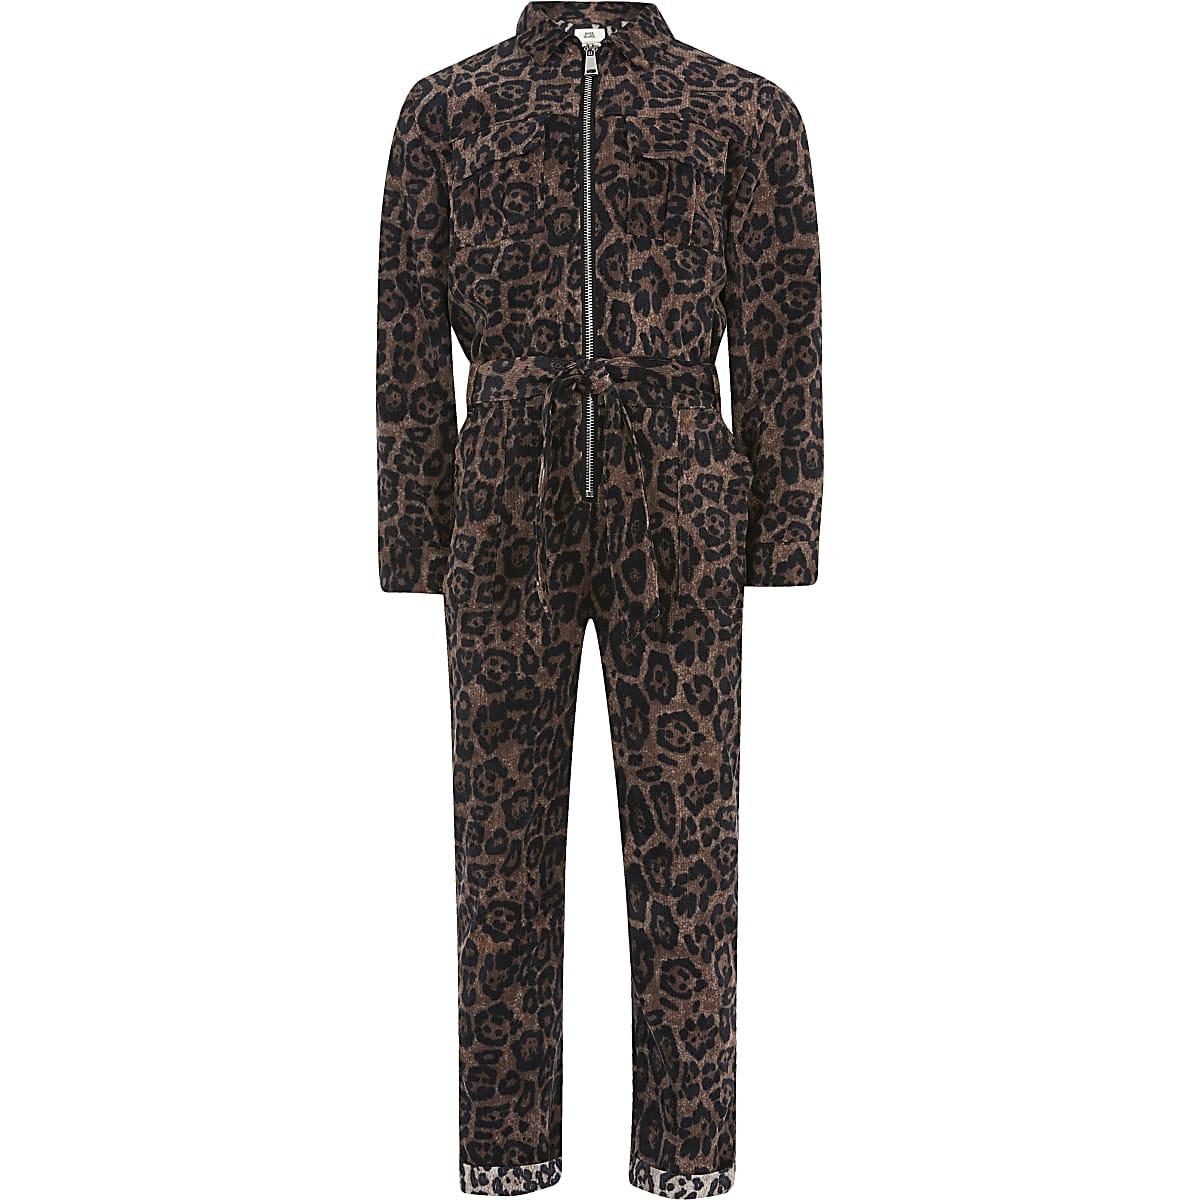 Girls brown leopard print corduroy jumpsuit